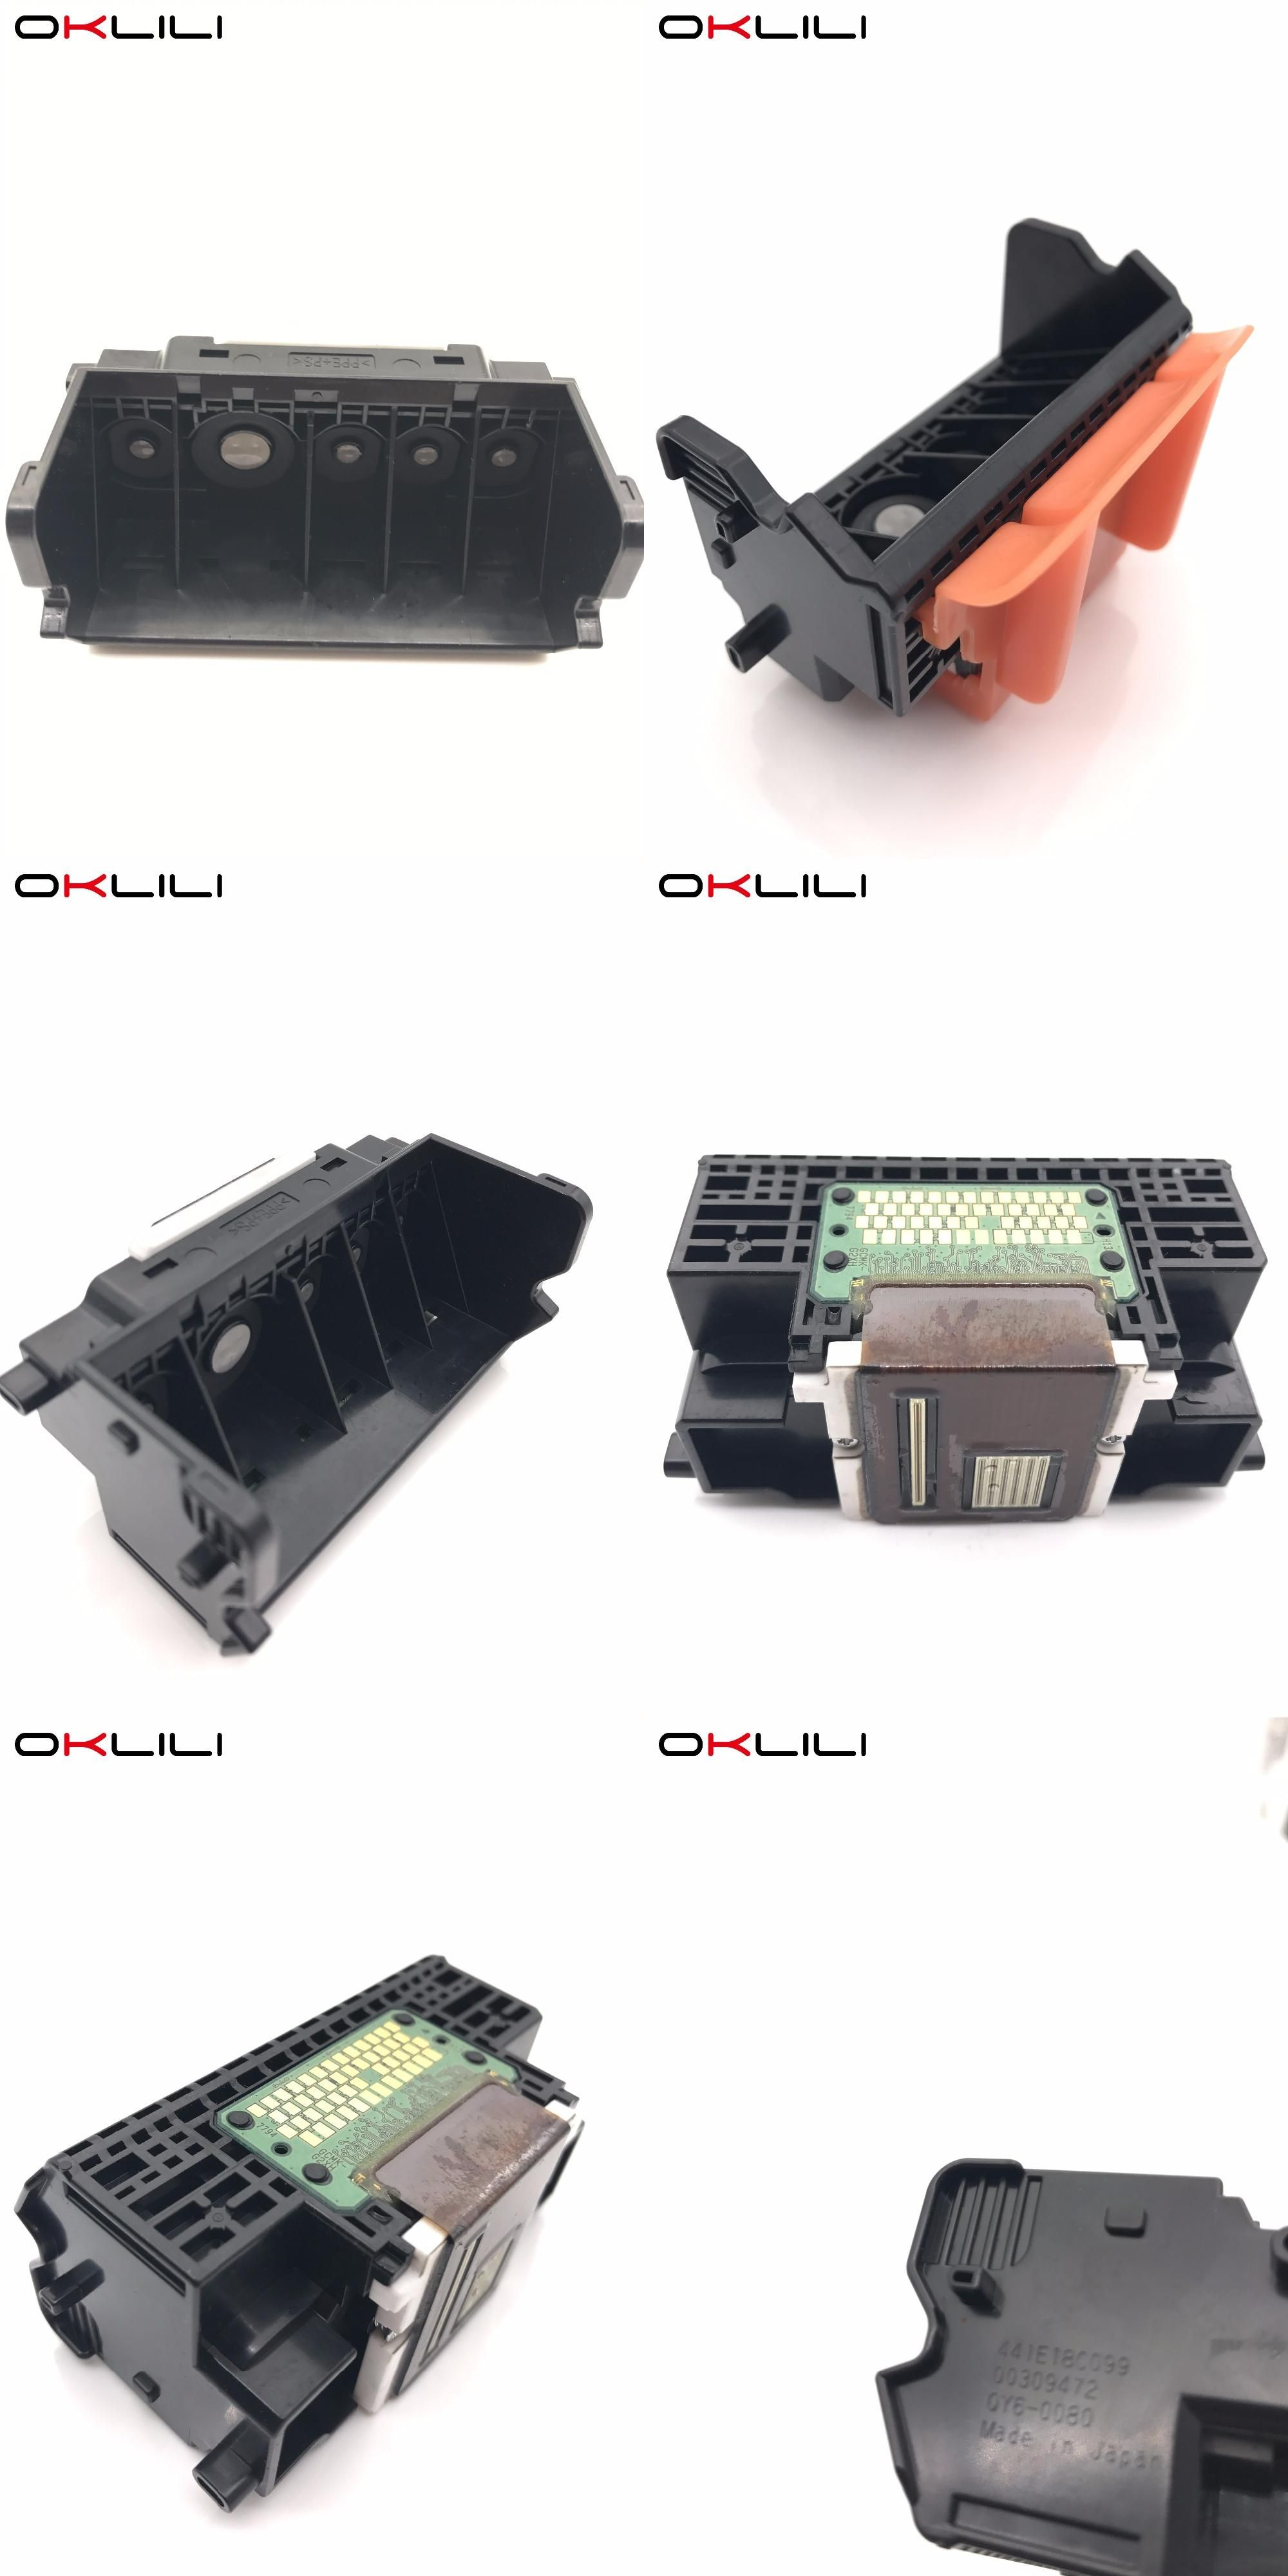 medium resolution of  visit to buy oklili qy6 0080 printhead print head printer for canon ip4820 ip4850 ix6520 ix6550 mx715 mx885 mg5220 mg5250 mg5320 mg5350 advertisement